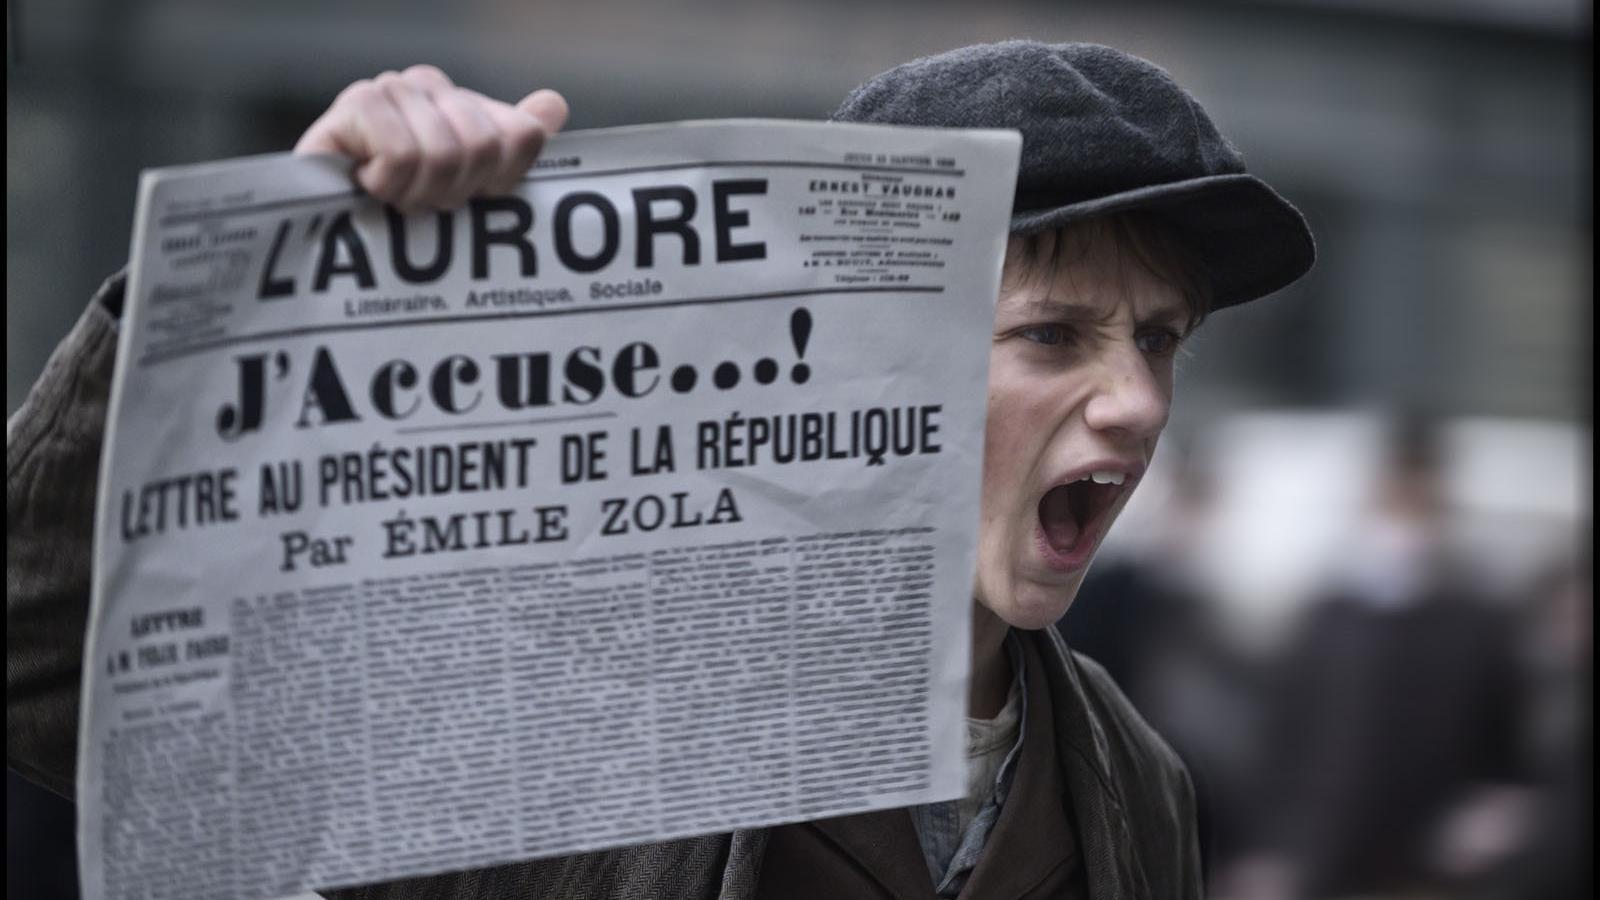 L'article de Zola, 'Jo acuso' al diari 'L'Aurore', en un fotograma del film de Roman Polanski